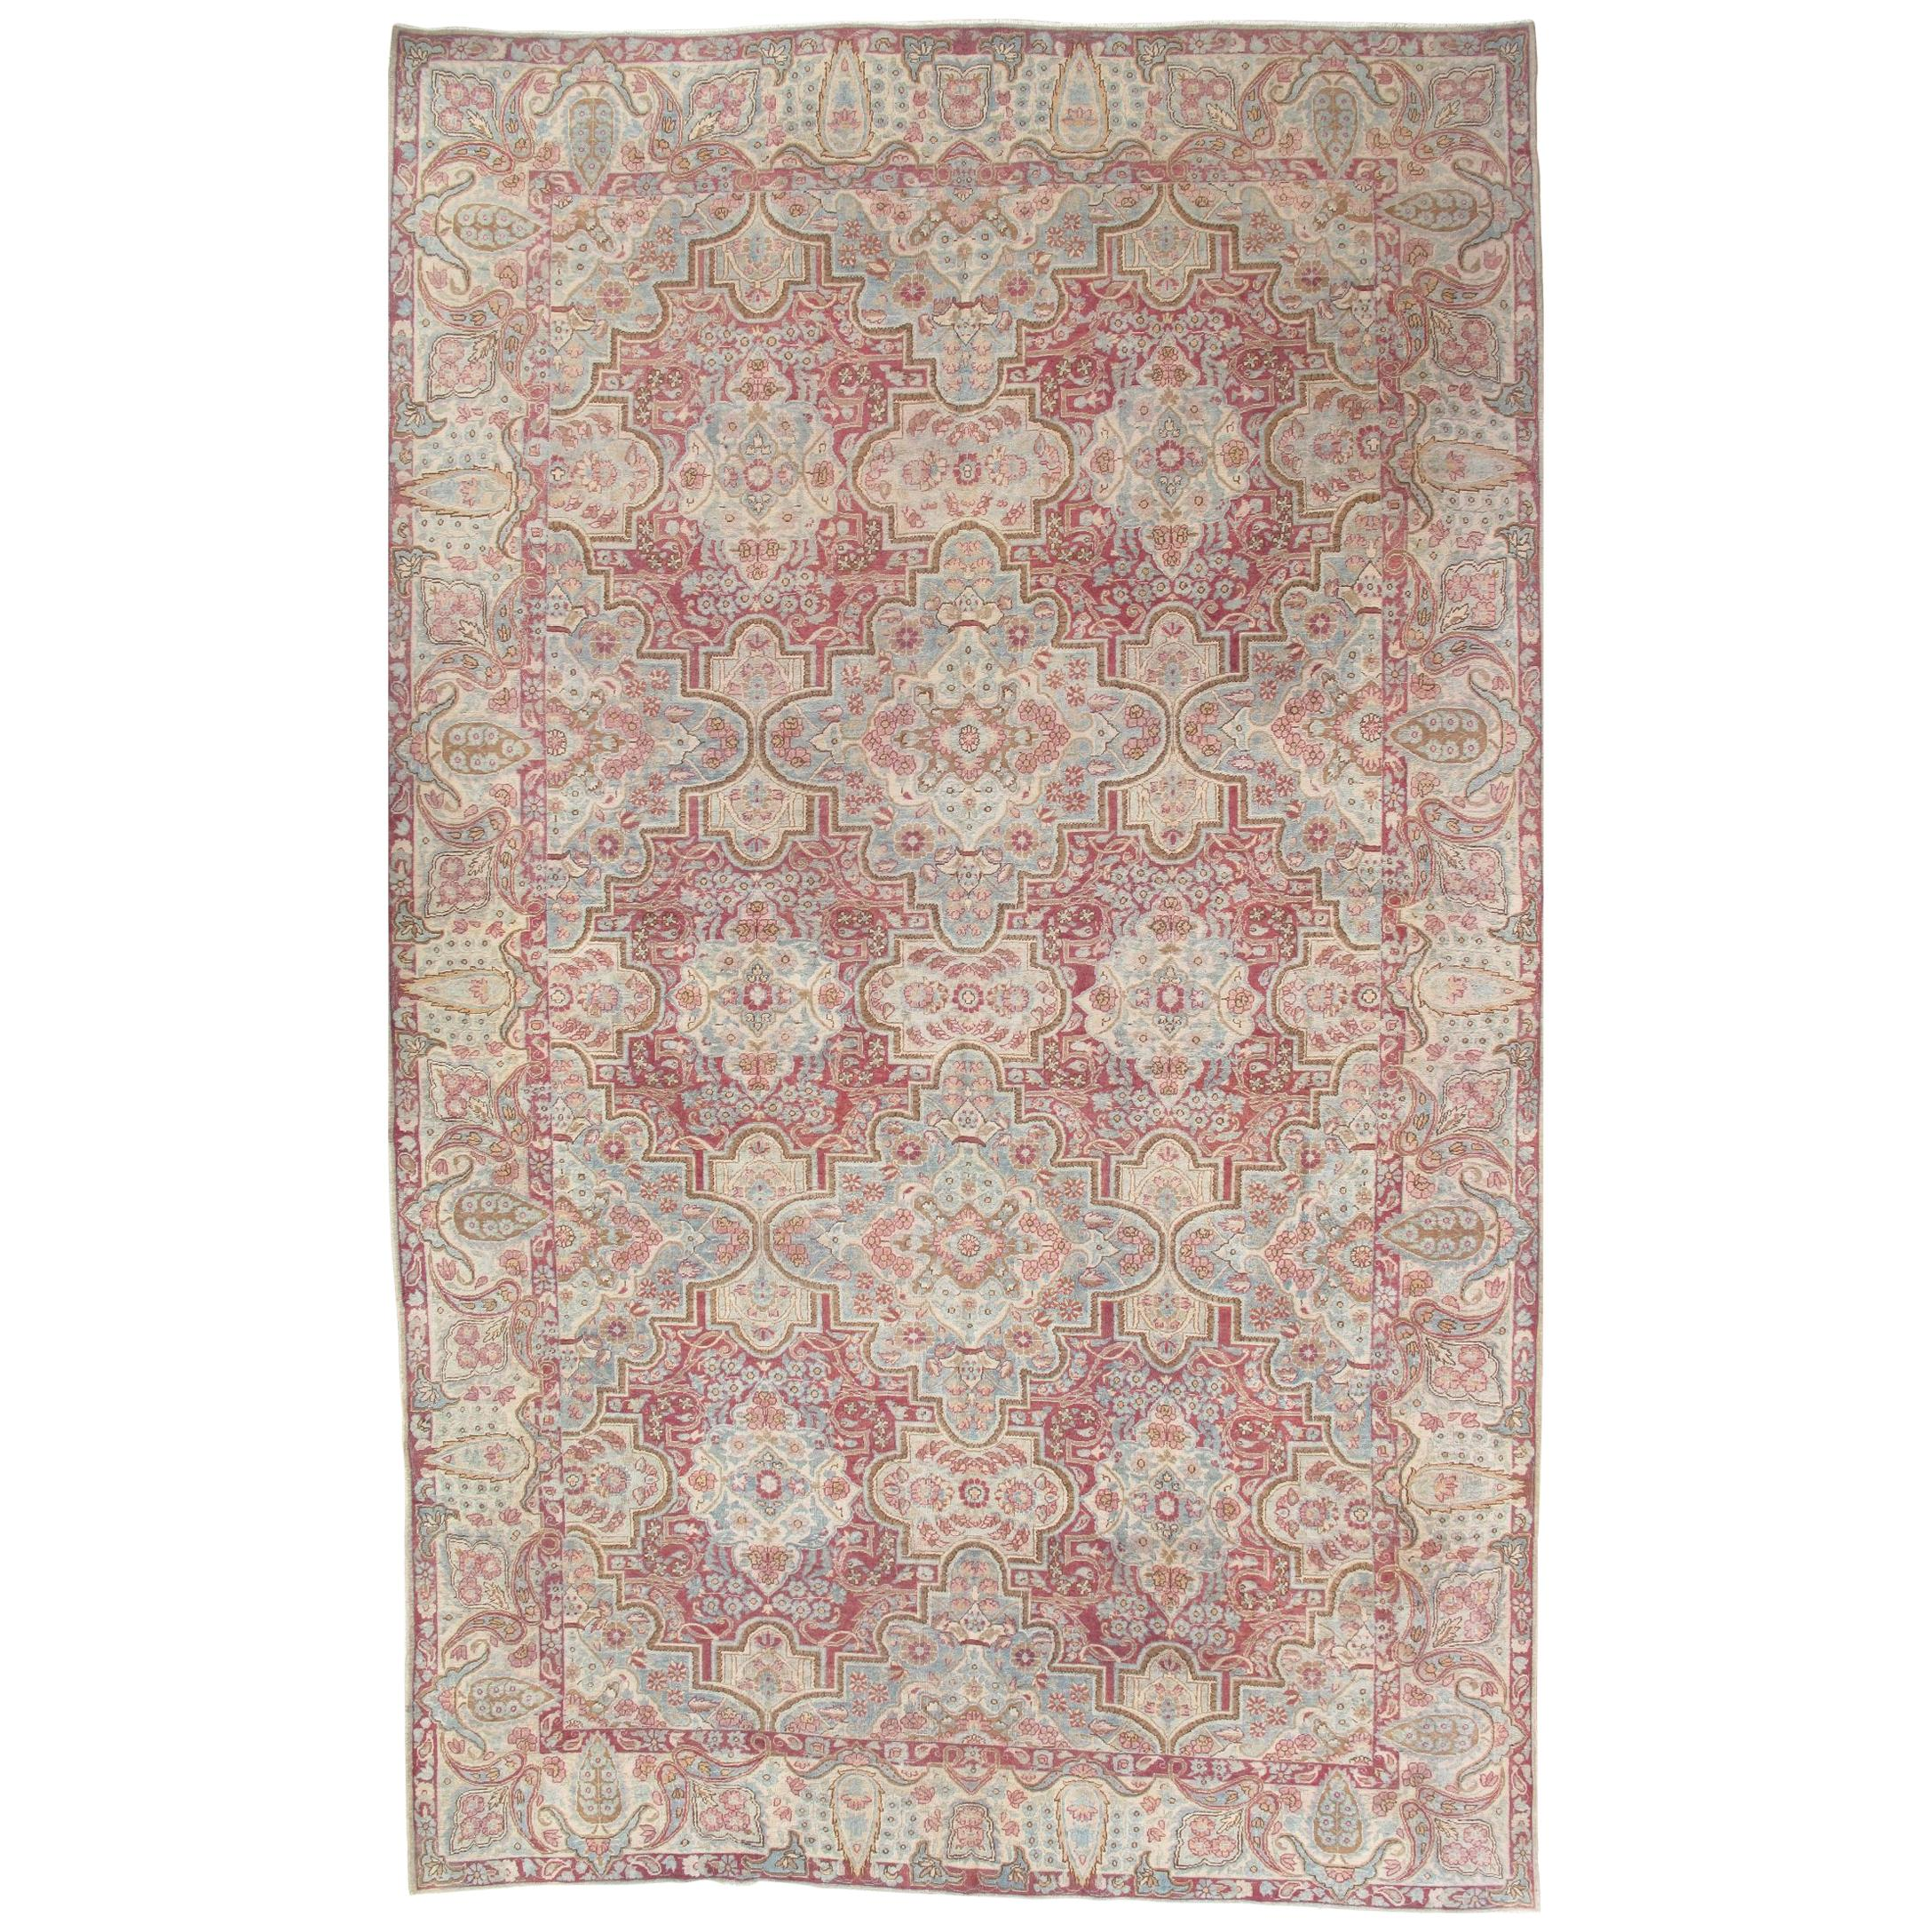 Antique Kerman Carpet, Handmade Persian Rug Wool Carpet Lt Blue, Beige and Coral